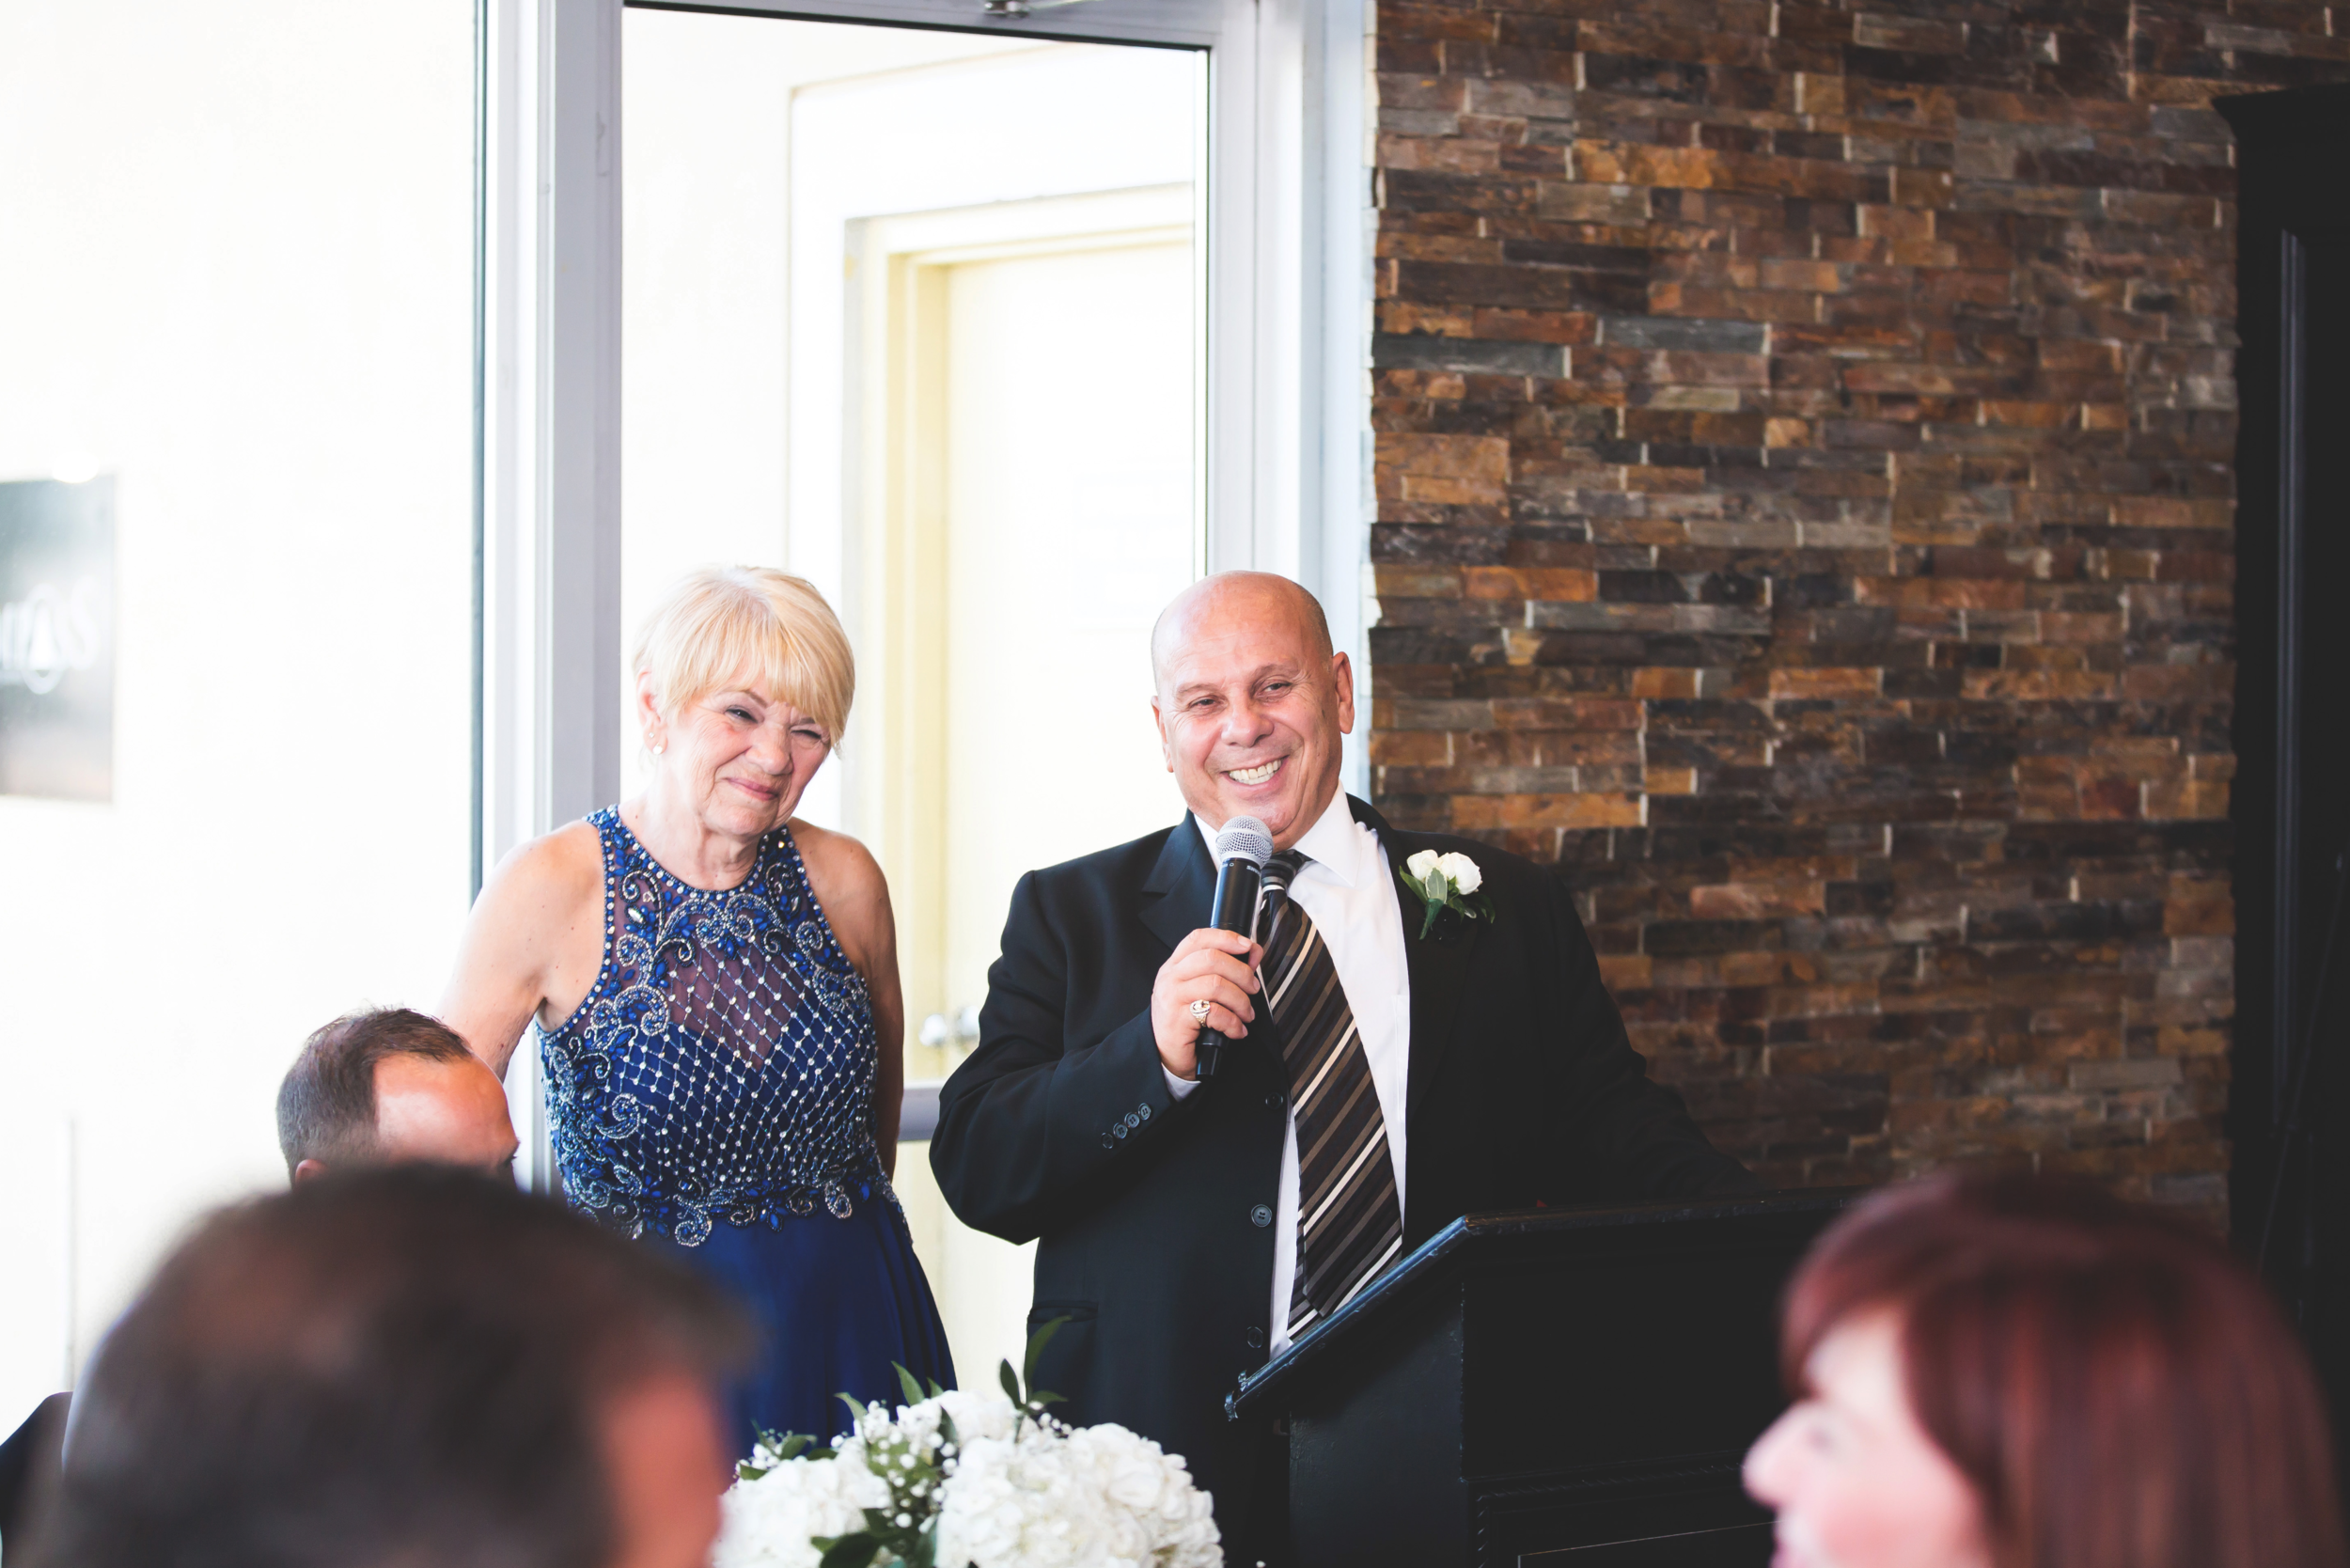 Wedding-Harbour-Banquet-Center-Oakville-Photographer-Wedding-Hamilton-Saint-James-Espresso-Downtown-HamOnt-GTA-Niagara-Toronto-Moments-by-Lauren-Photography-Photo-Image-63.png